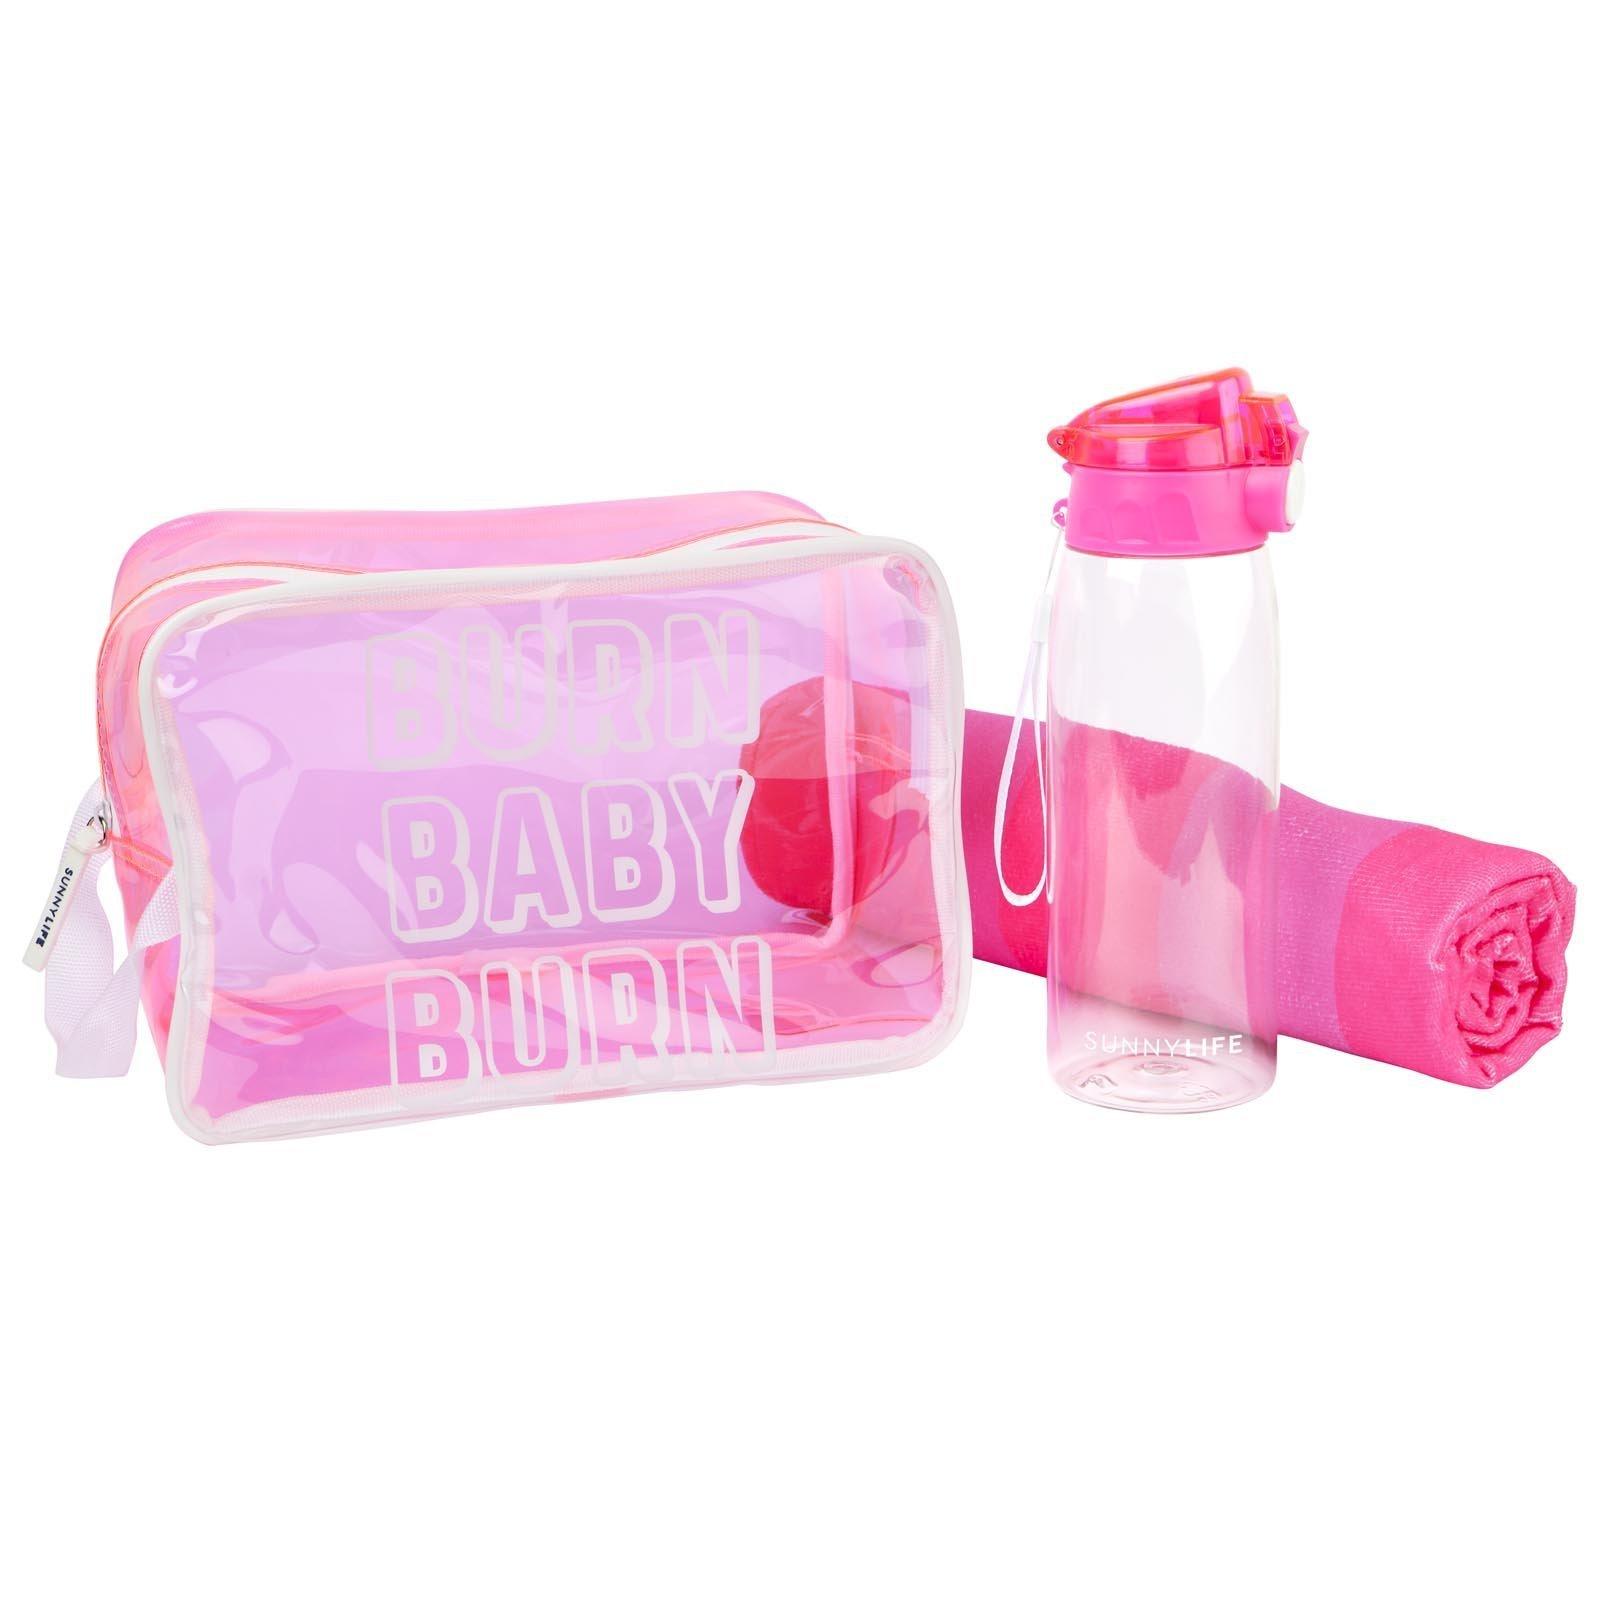 Sunnylife Active Kit - Neon Pink image